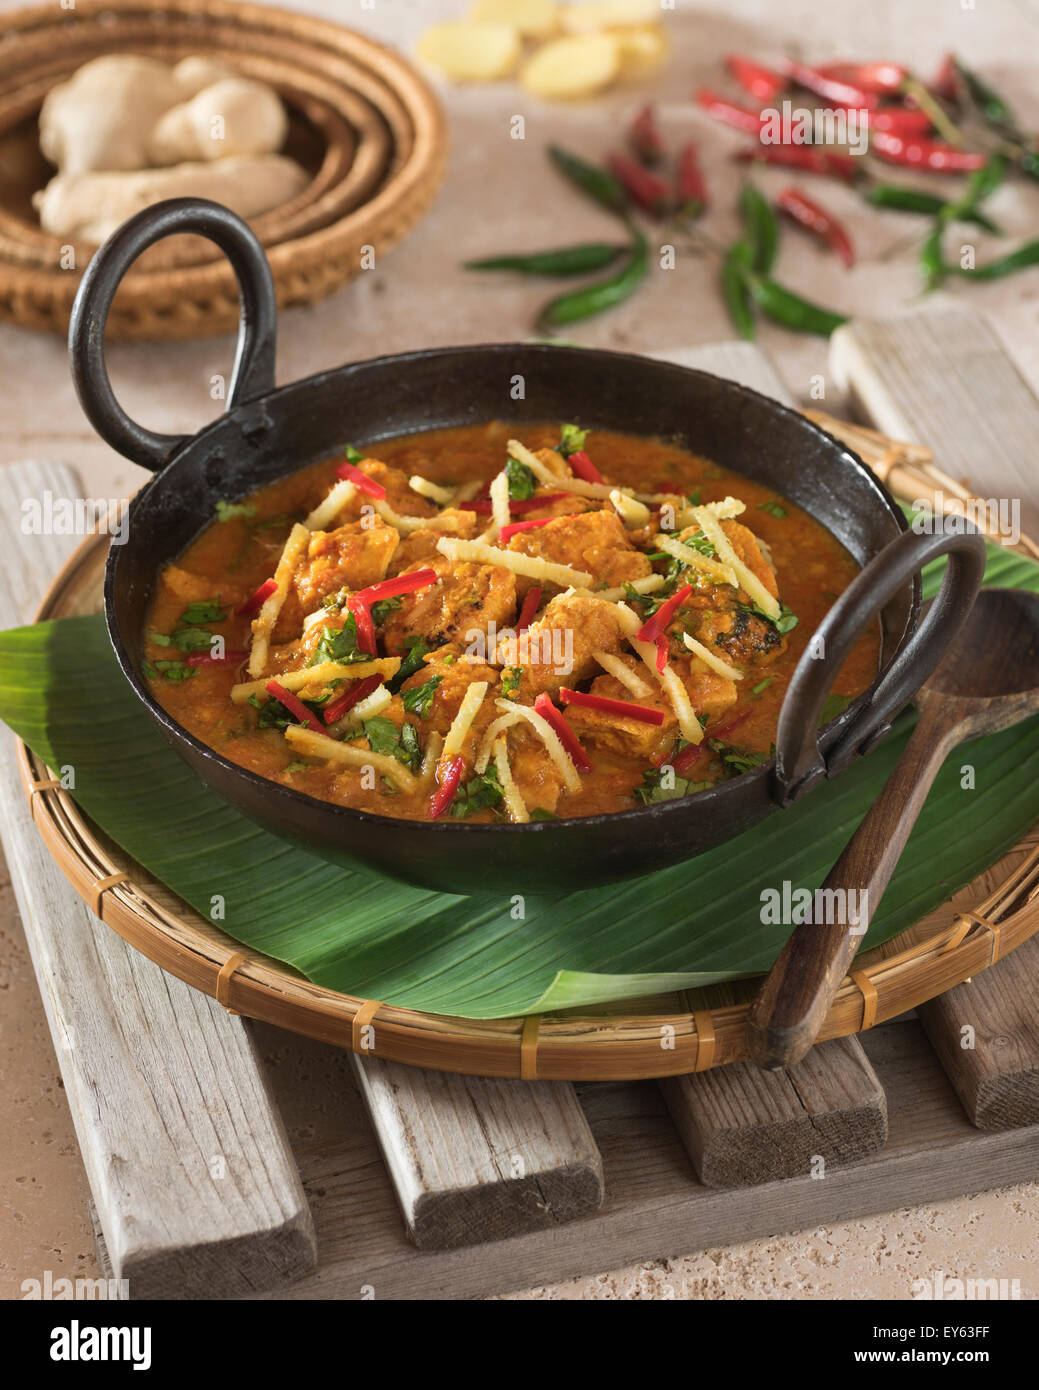 Adraki Murgh Ginger Chicken Curry India Food Stock Photo